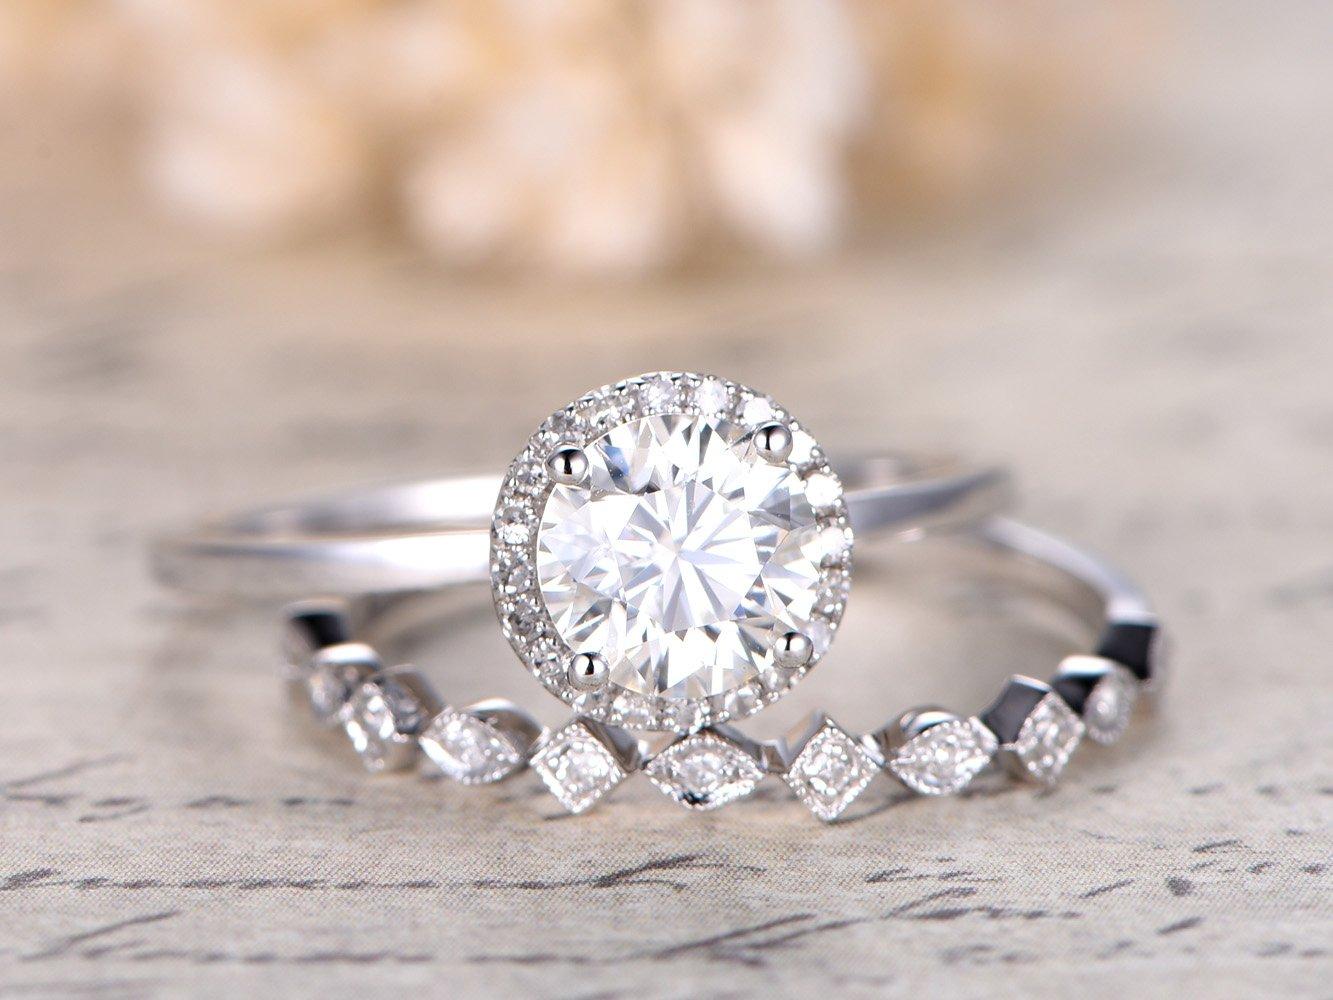 Moissanite Engagement Ring Set 6.5mm Round 14k White Gold Plain Band Halo Women Wedding Ring, Half Eternity Antique Marquise Milgrain Diamonds Stacking Bands Anniversary Promise for Her